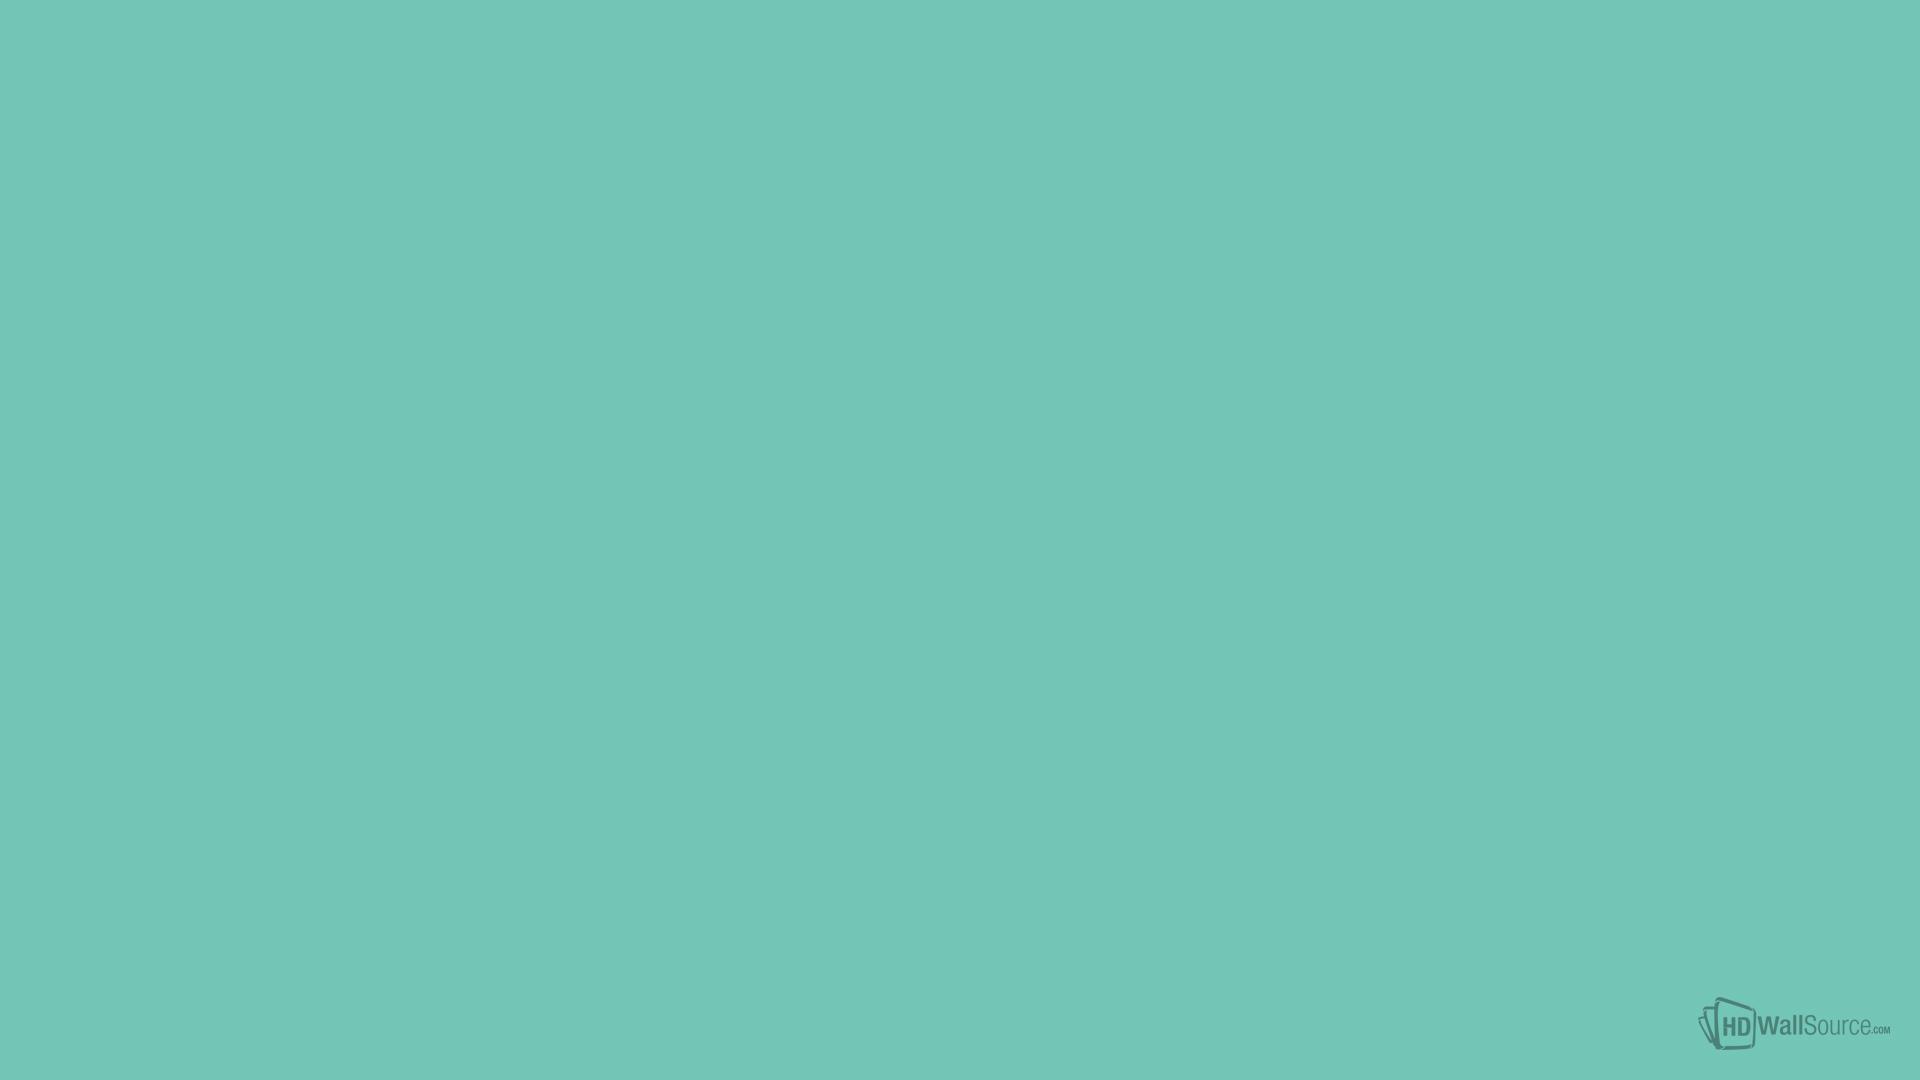 73c6b6 wallpaper 70815